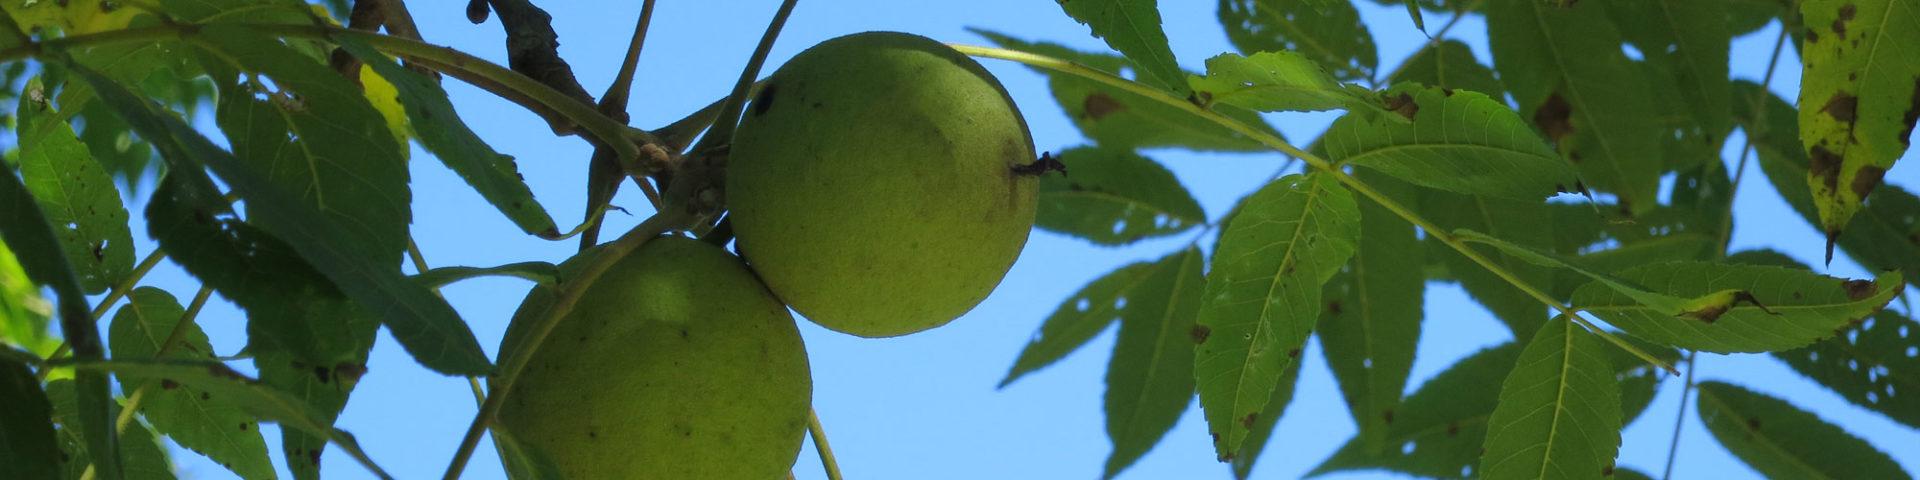 Black walnut leaves against sky